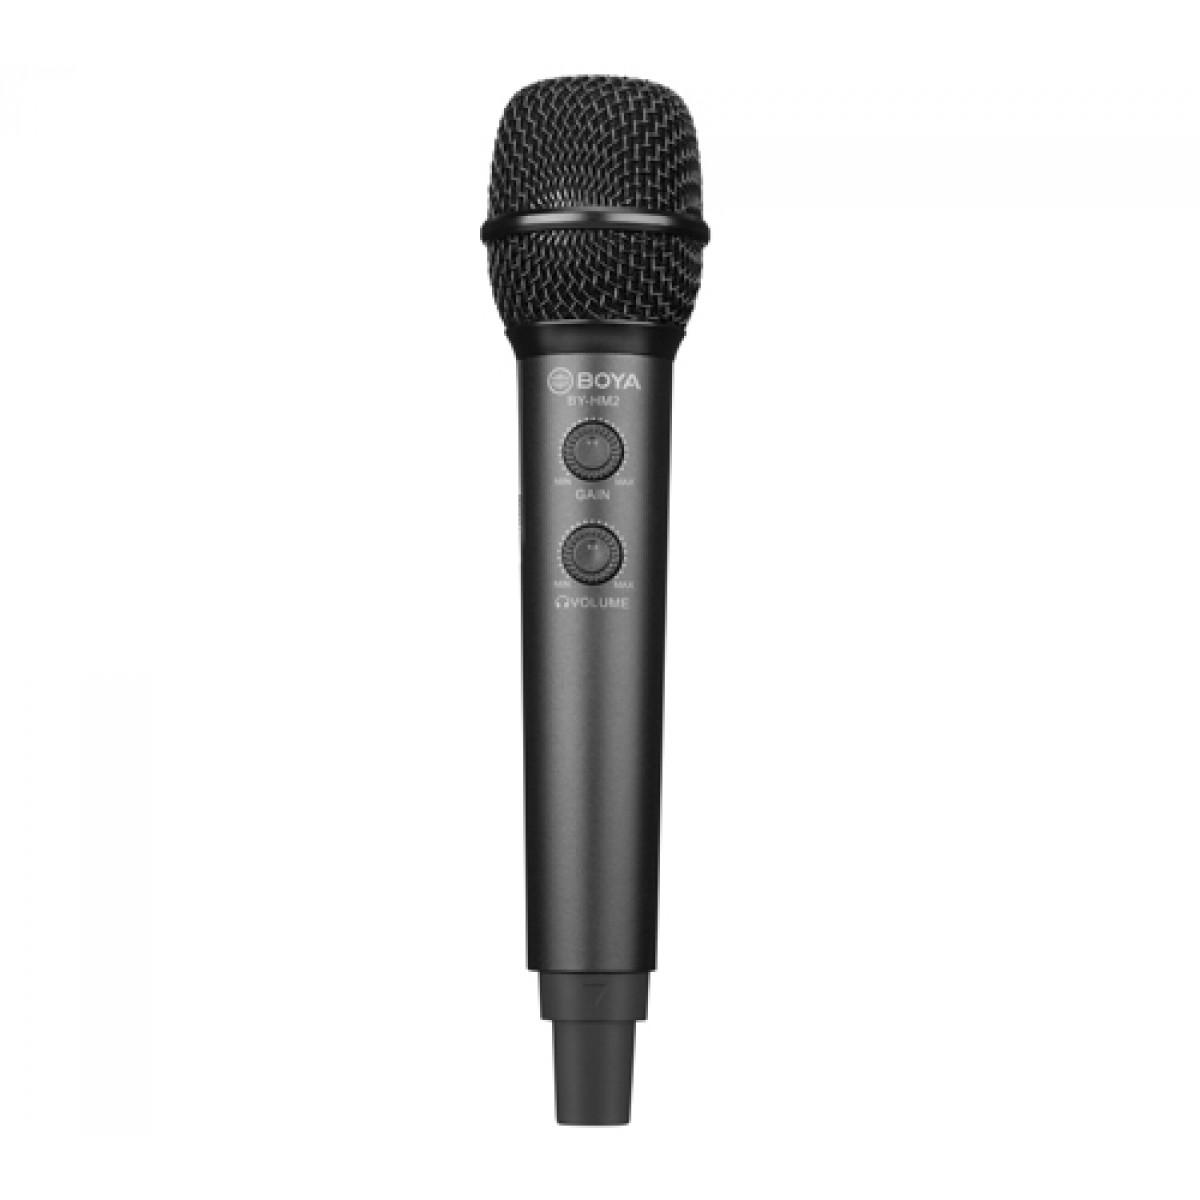 Microfone Digital BOYA BY-HM2, Com Tripé, USB Tipo C, Tipo A e Lighting, Black